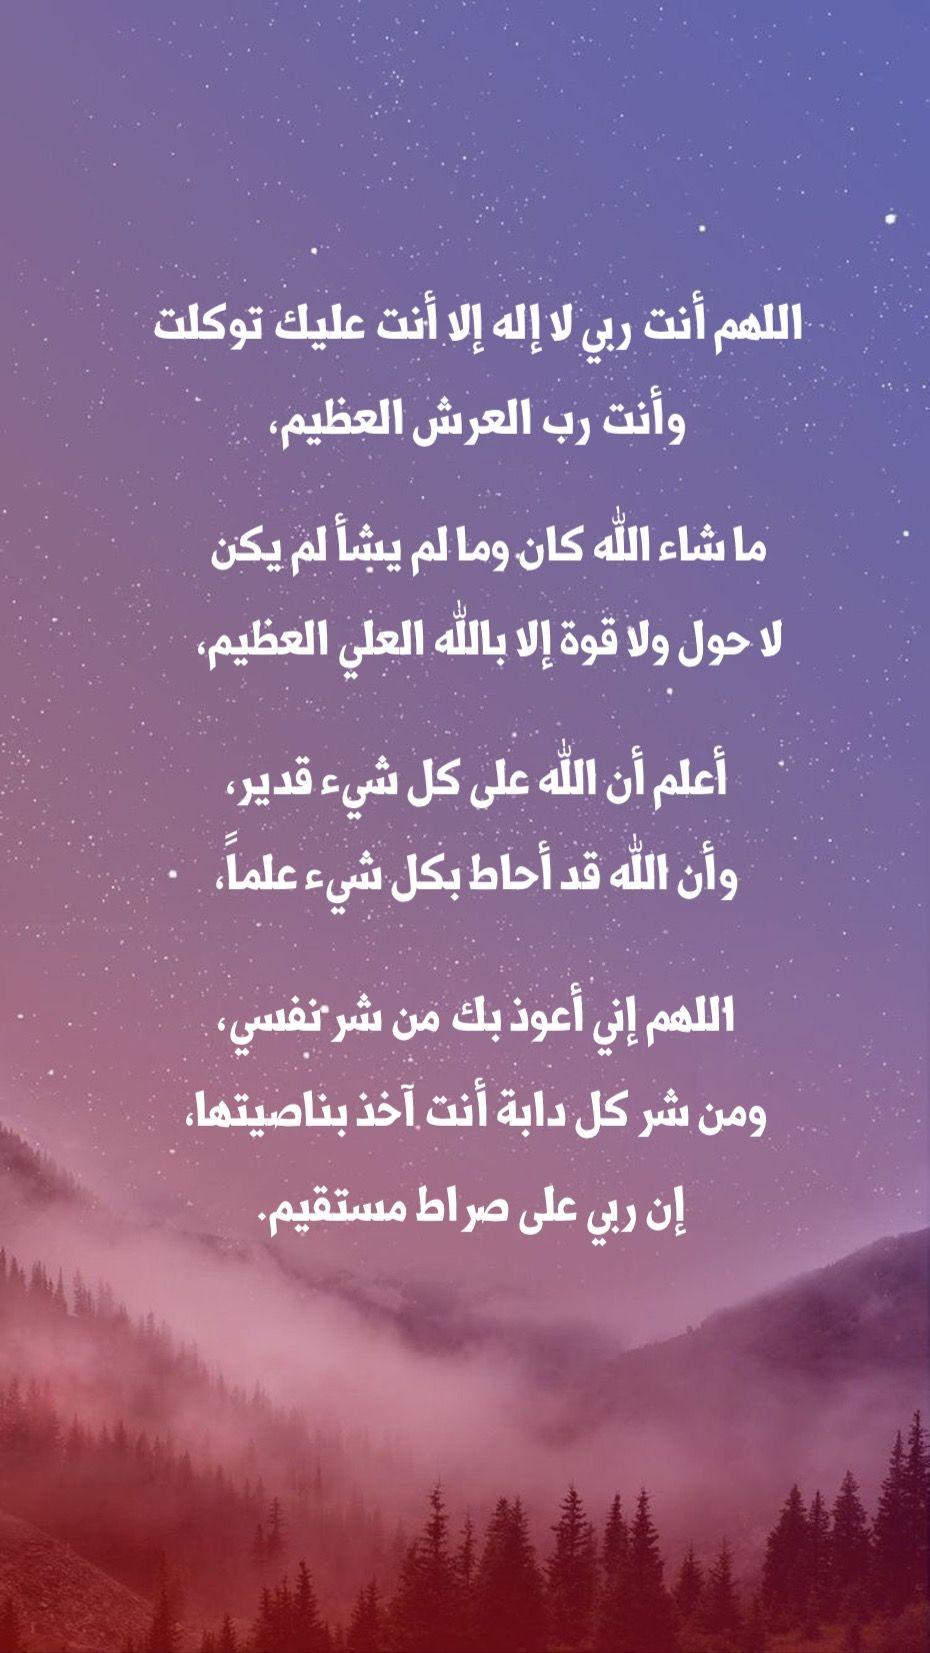 اذكار اللهم دعاء الله يارب Islamic Quotes Arabic Quotes Quotes